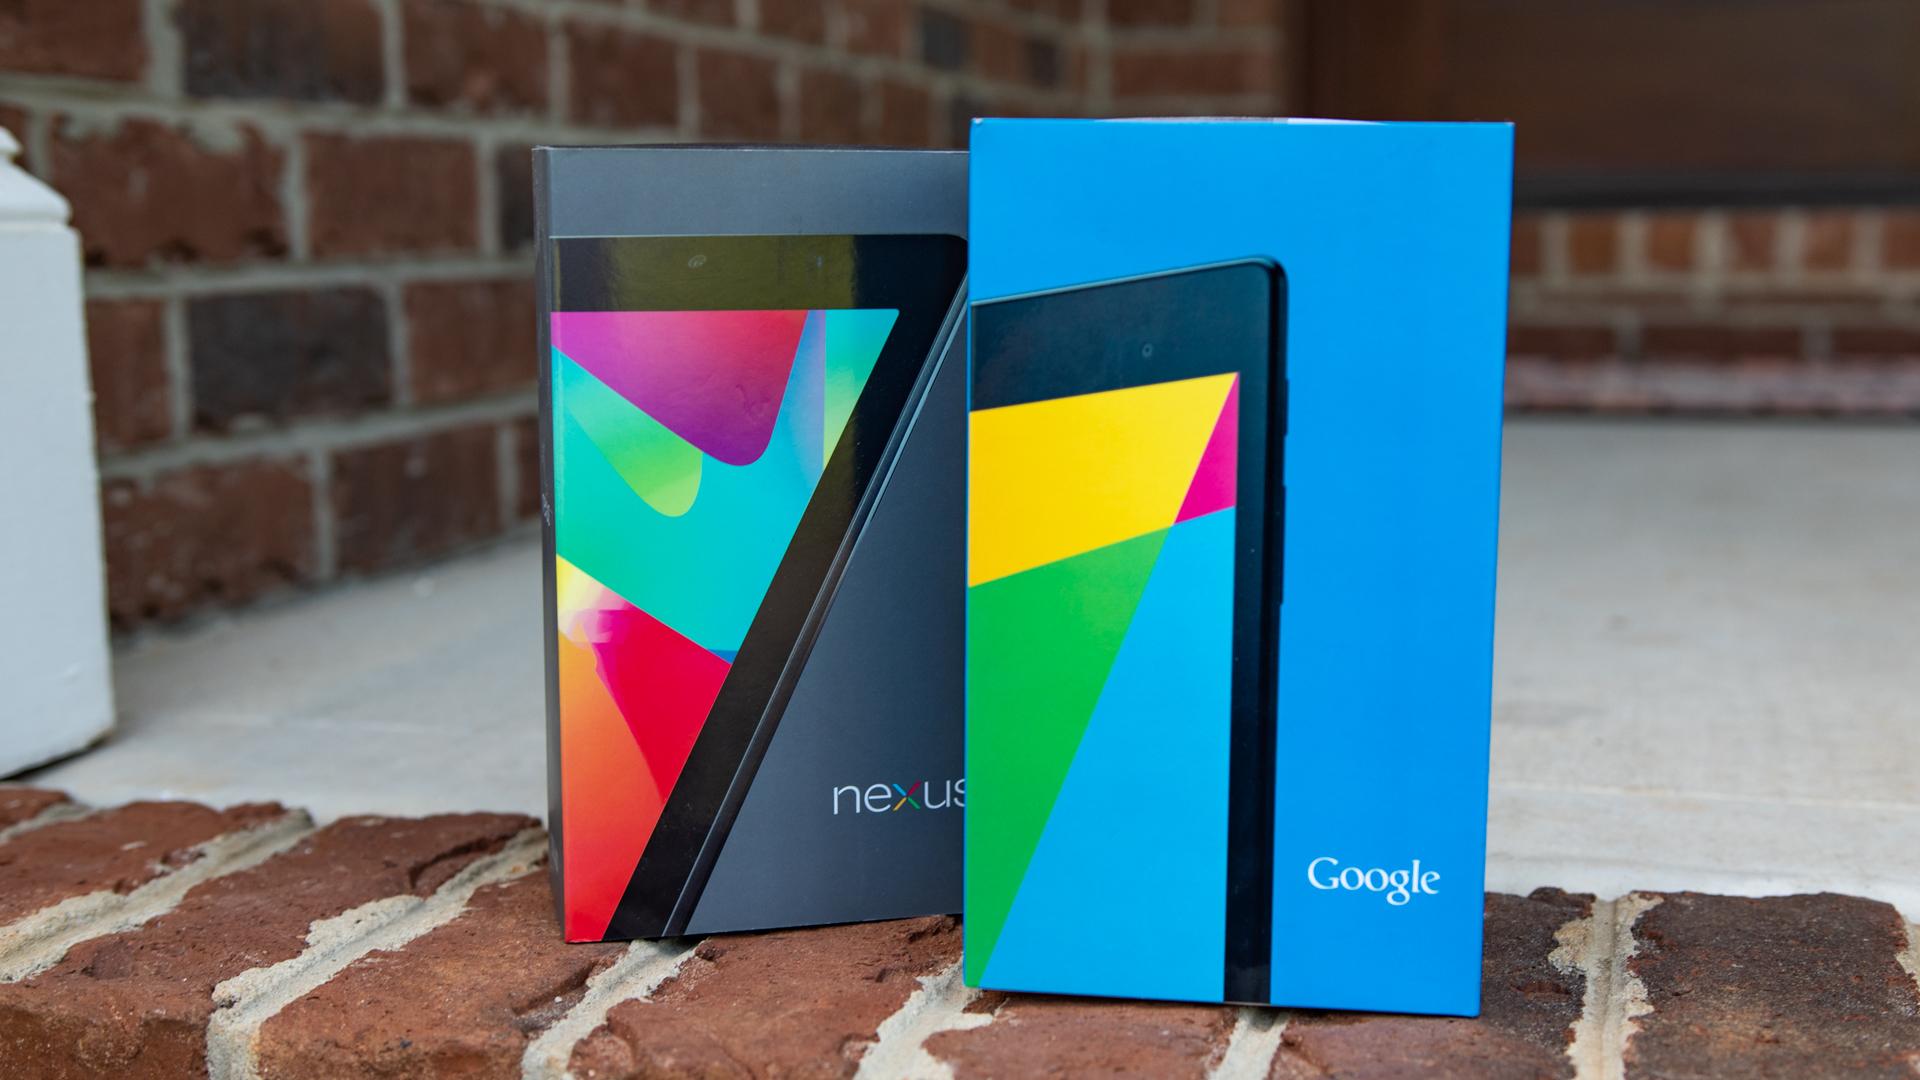 Google Nexus 7 Boxes